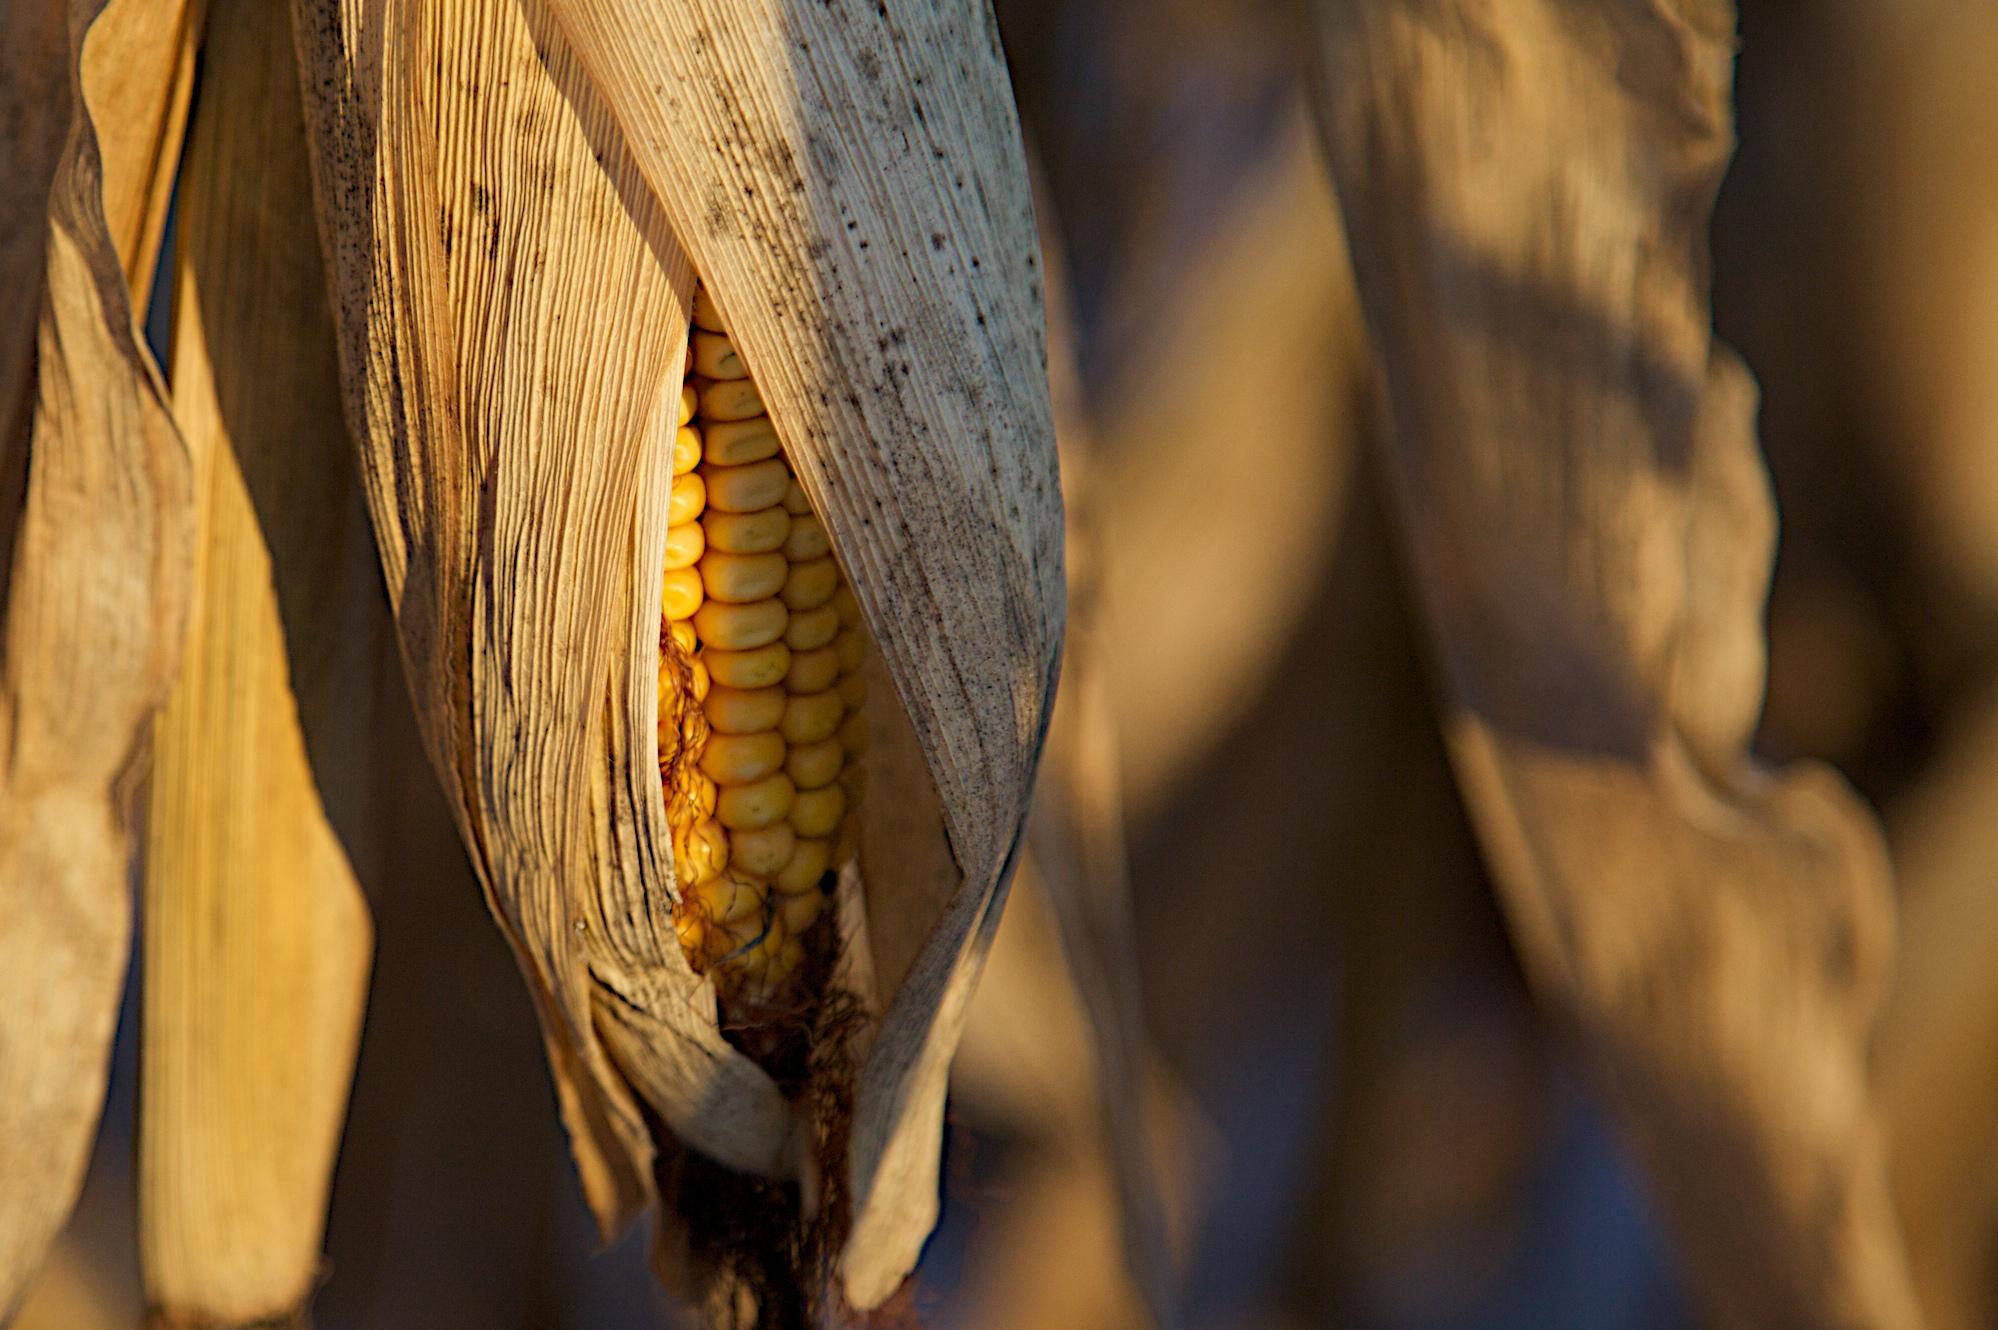 Ears of corn hang on stalks